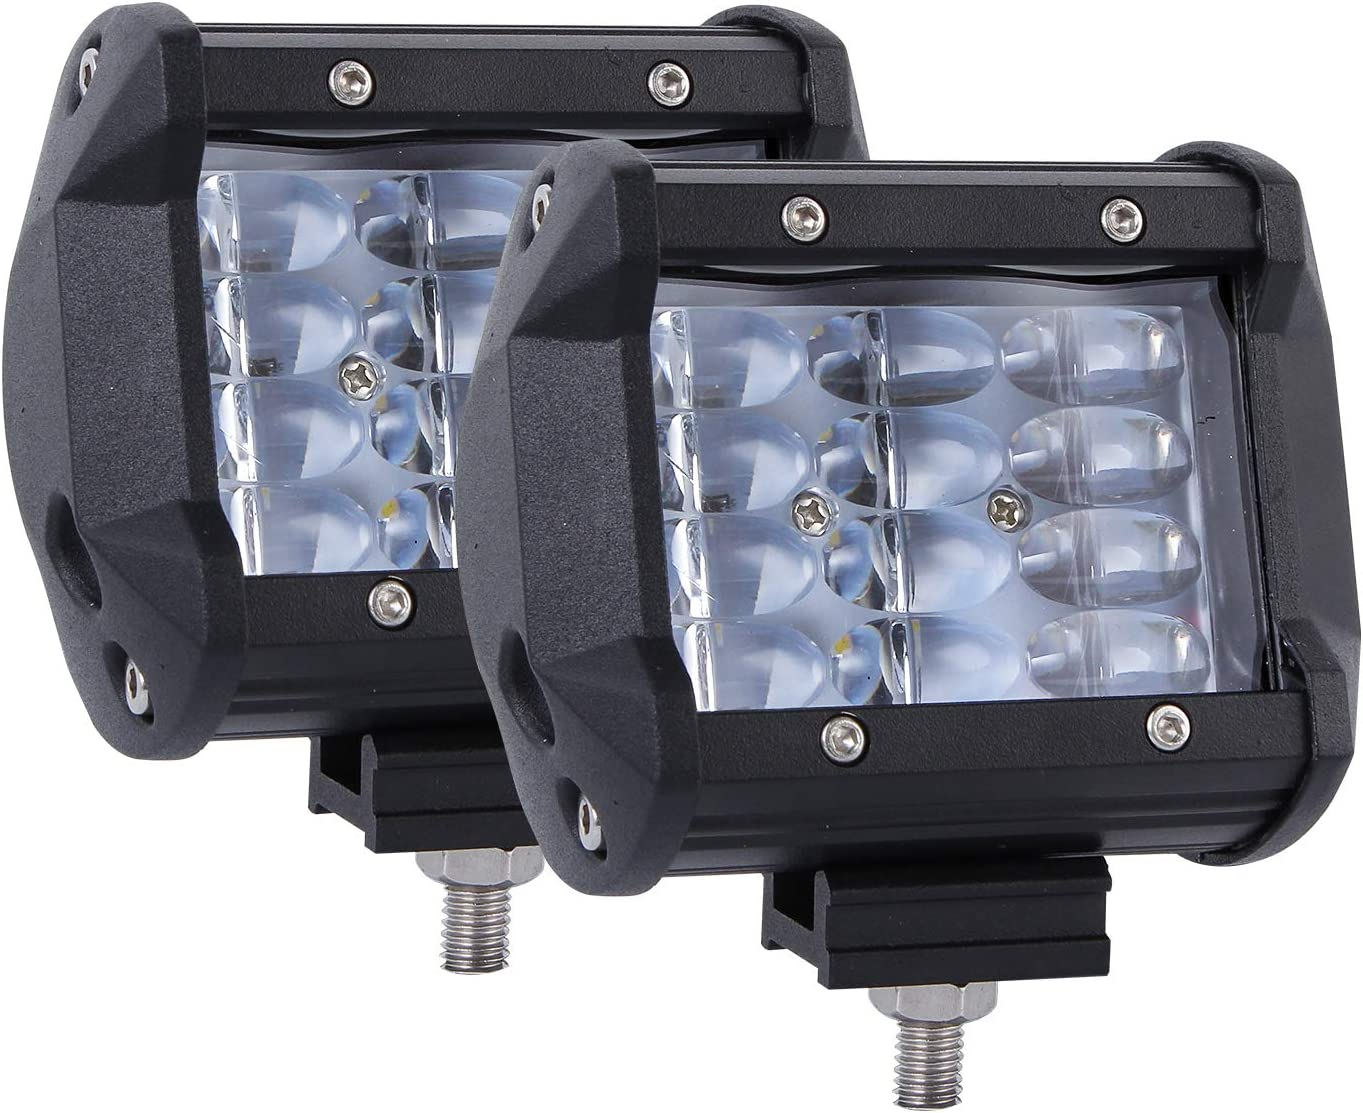 Auxbeam 3 Inch LED Light Bar 2Pcs 15w LED Pods with RGB Halo Ring Led Driving Lights Fog Lights for Off Road Jeep Trucks